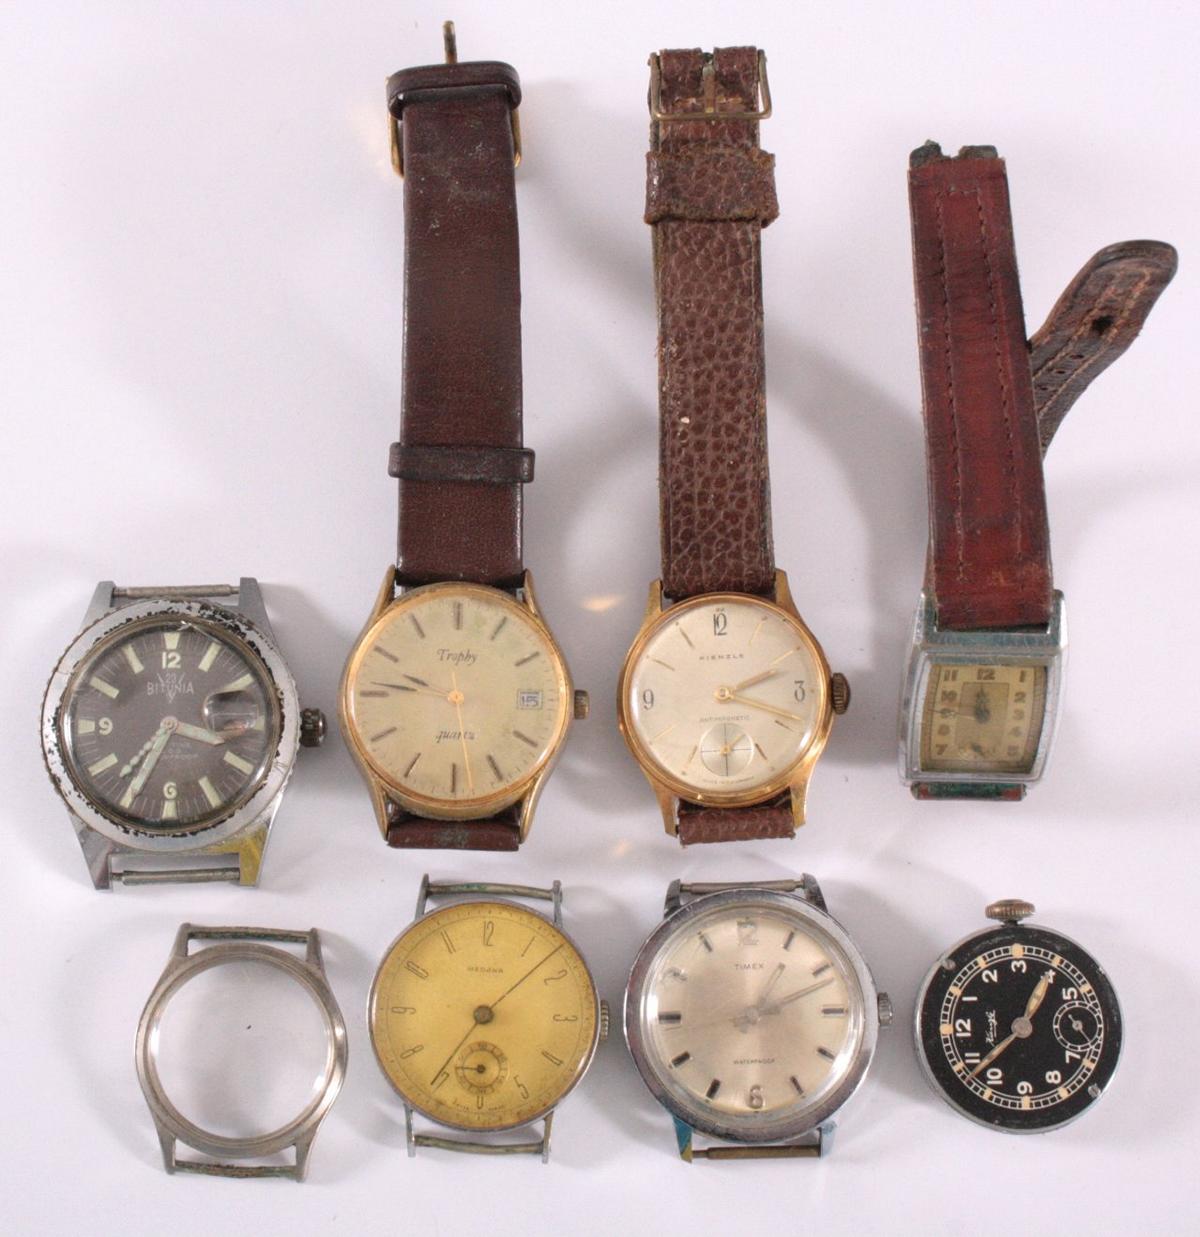 3 Herrenarmbanduhren, ohne Funktion